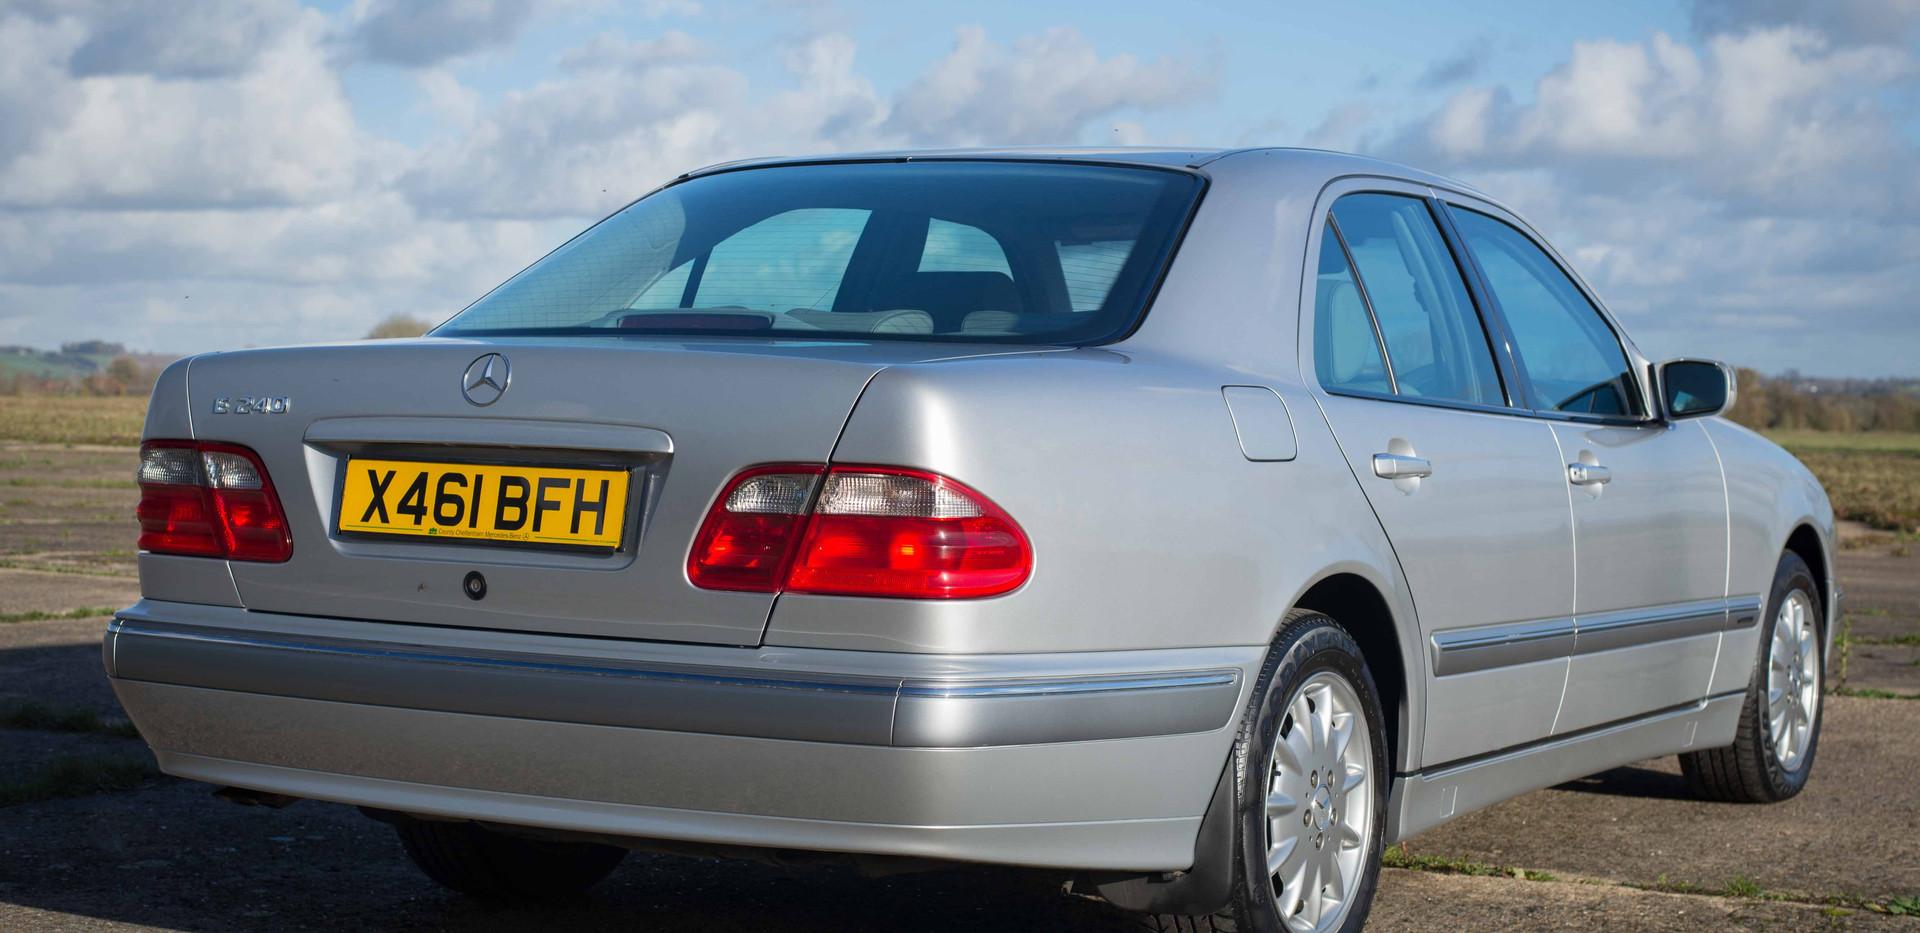 Mercedes E240 For Sale UK London  (32 of